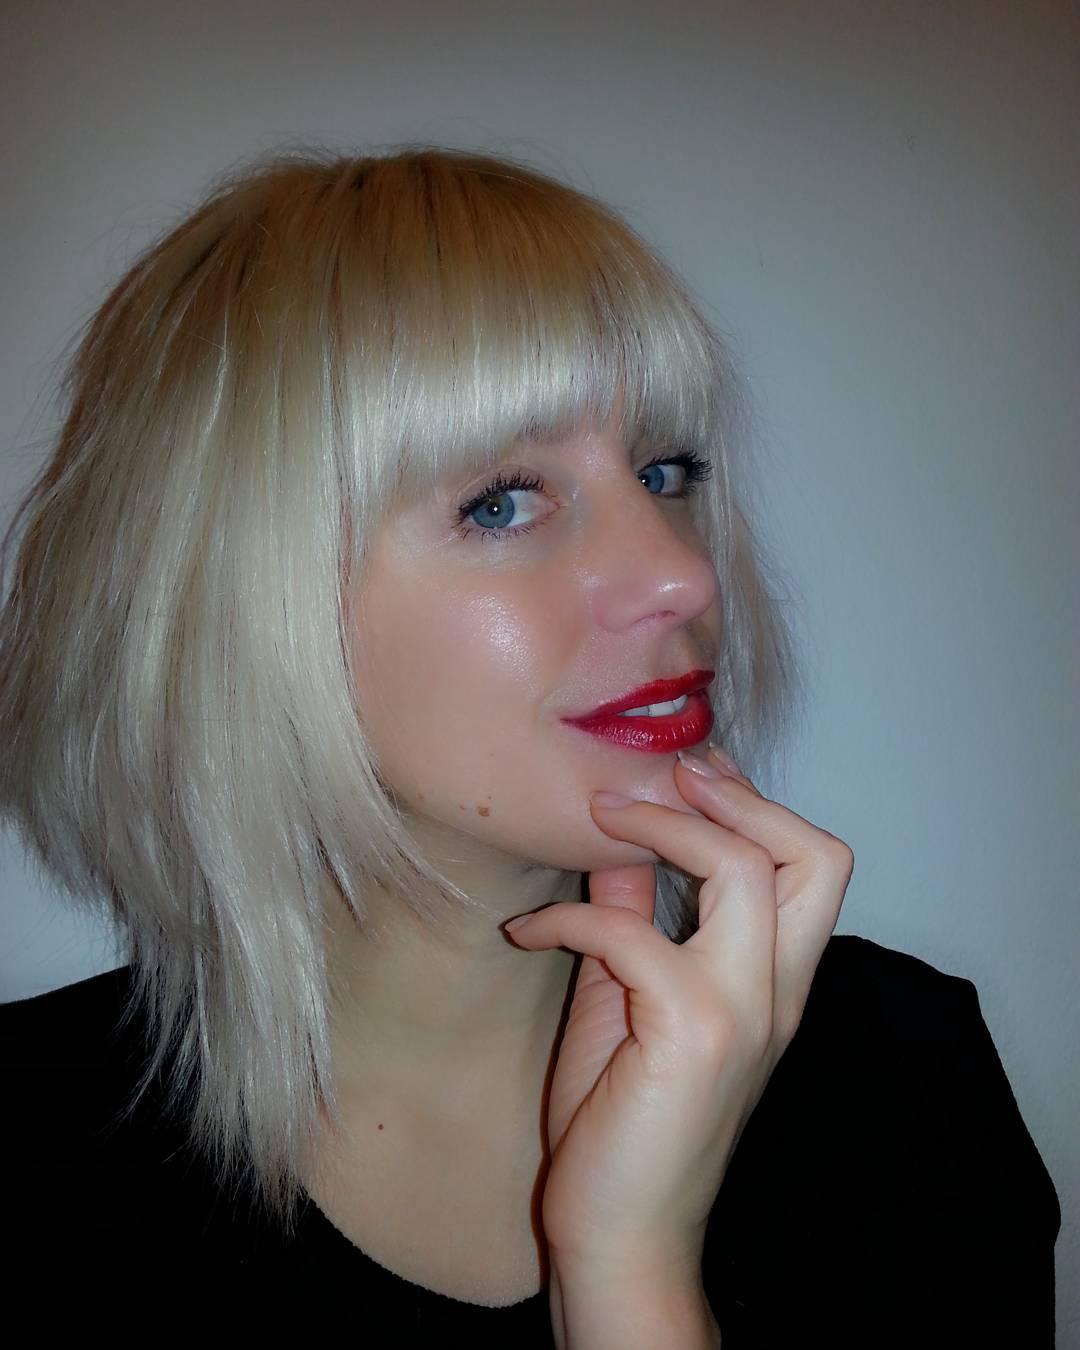 Stylish White Shag Haircut For Girls